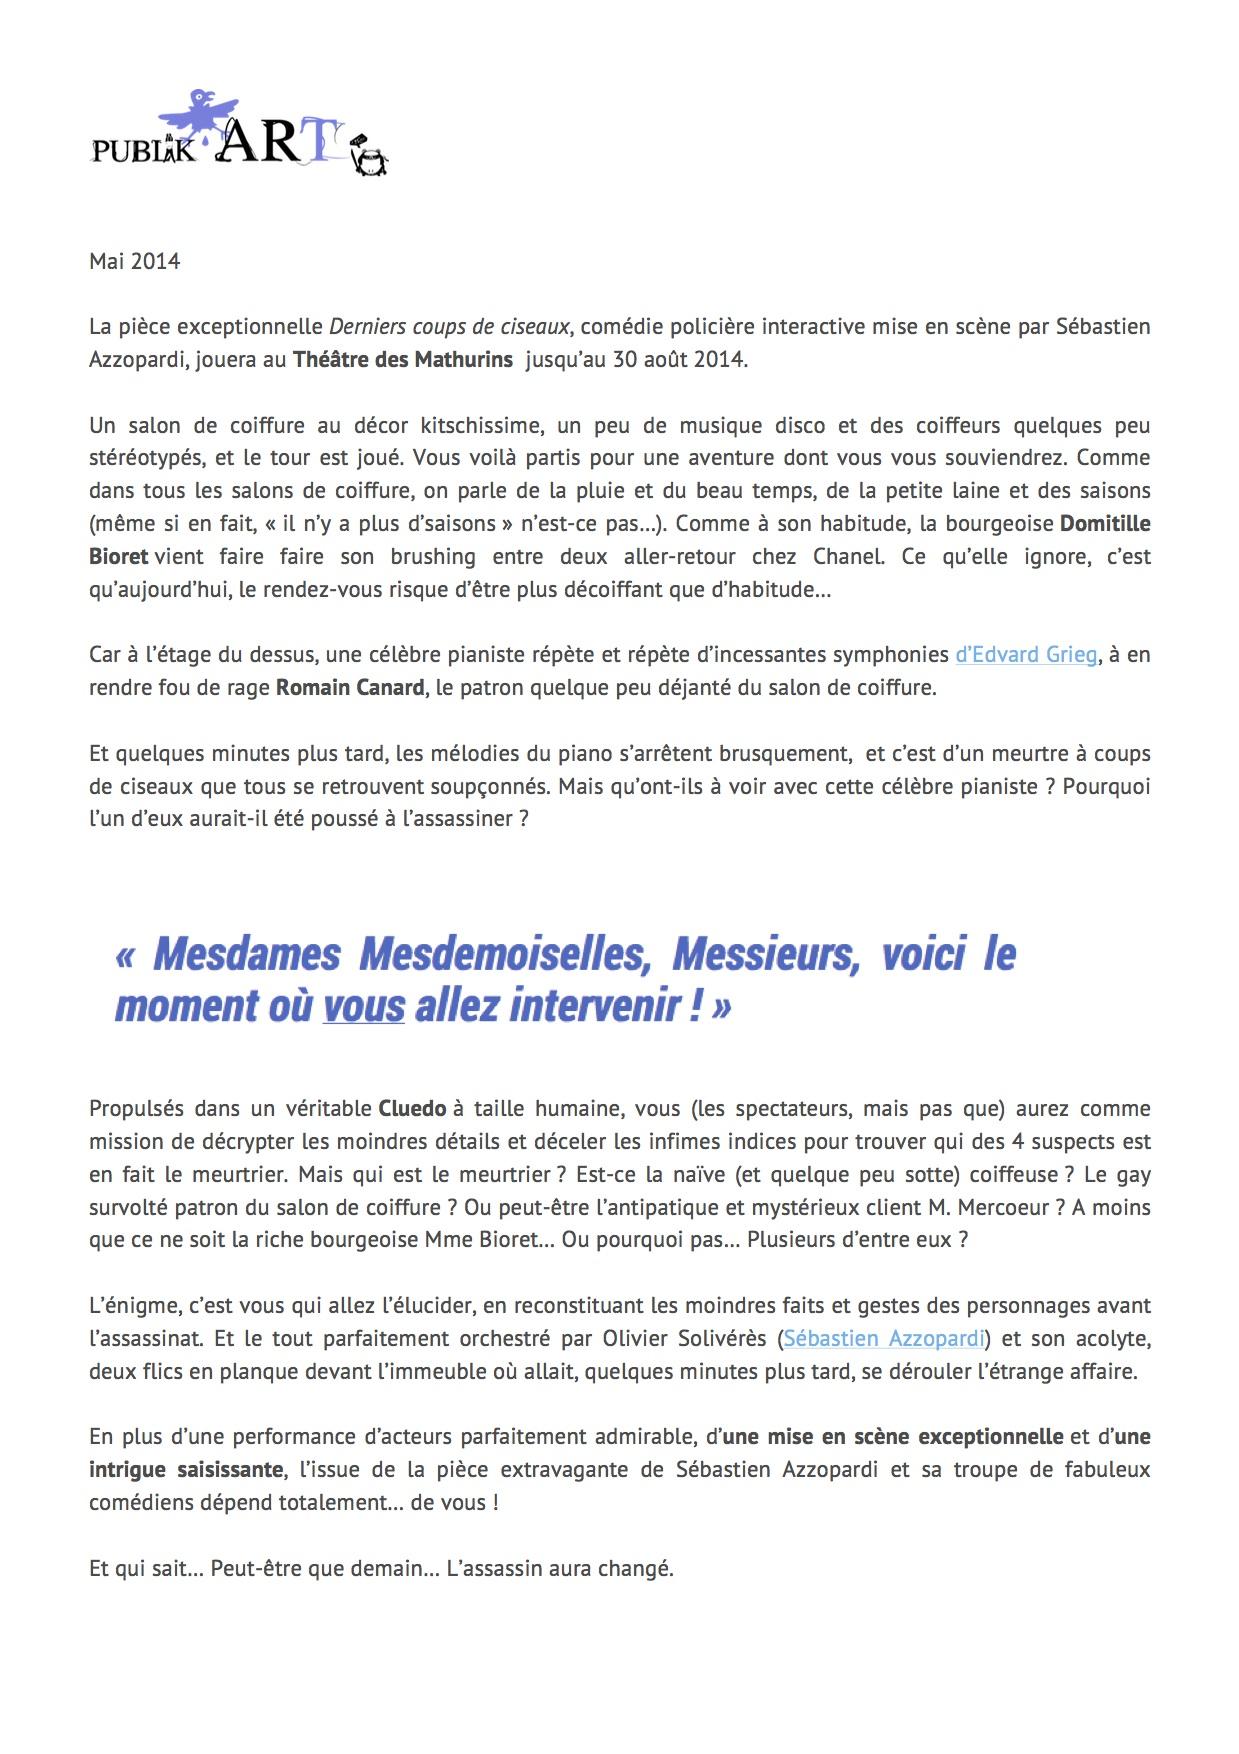 Publikart.fr mai 2014